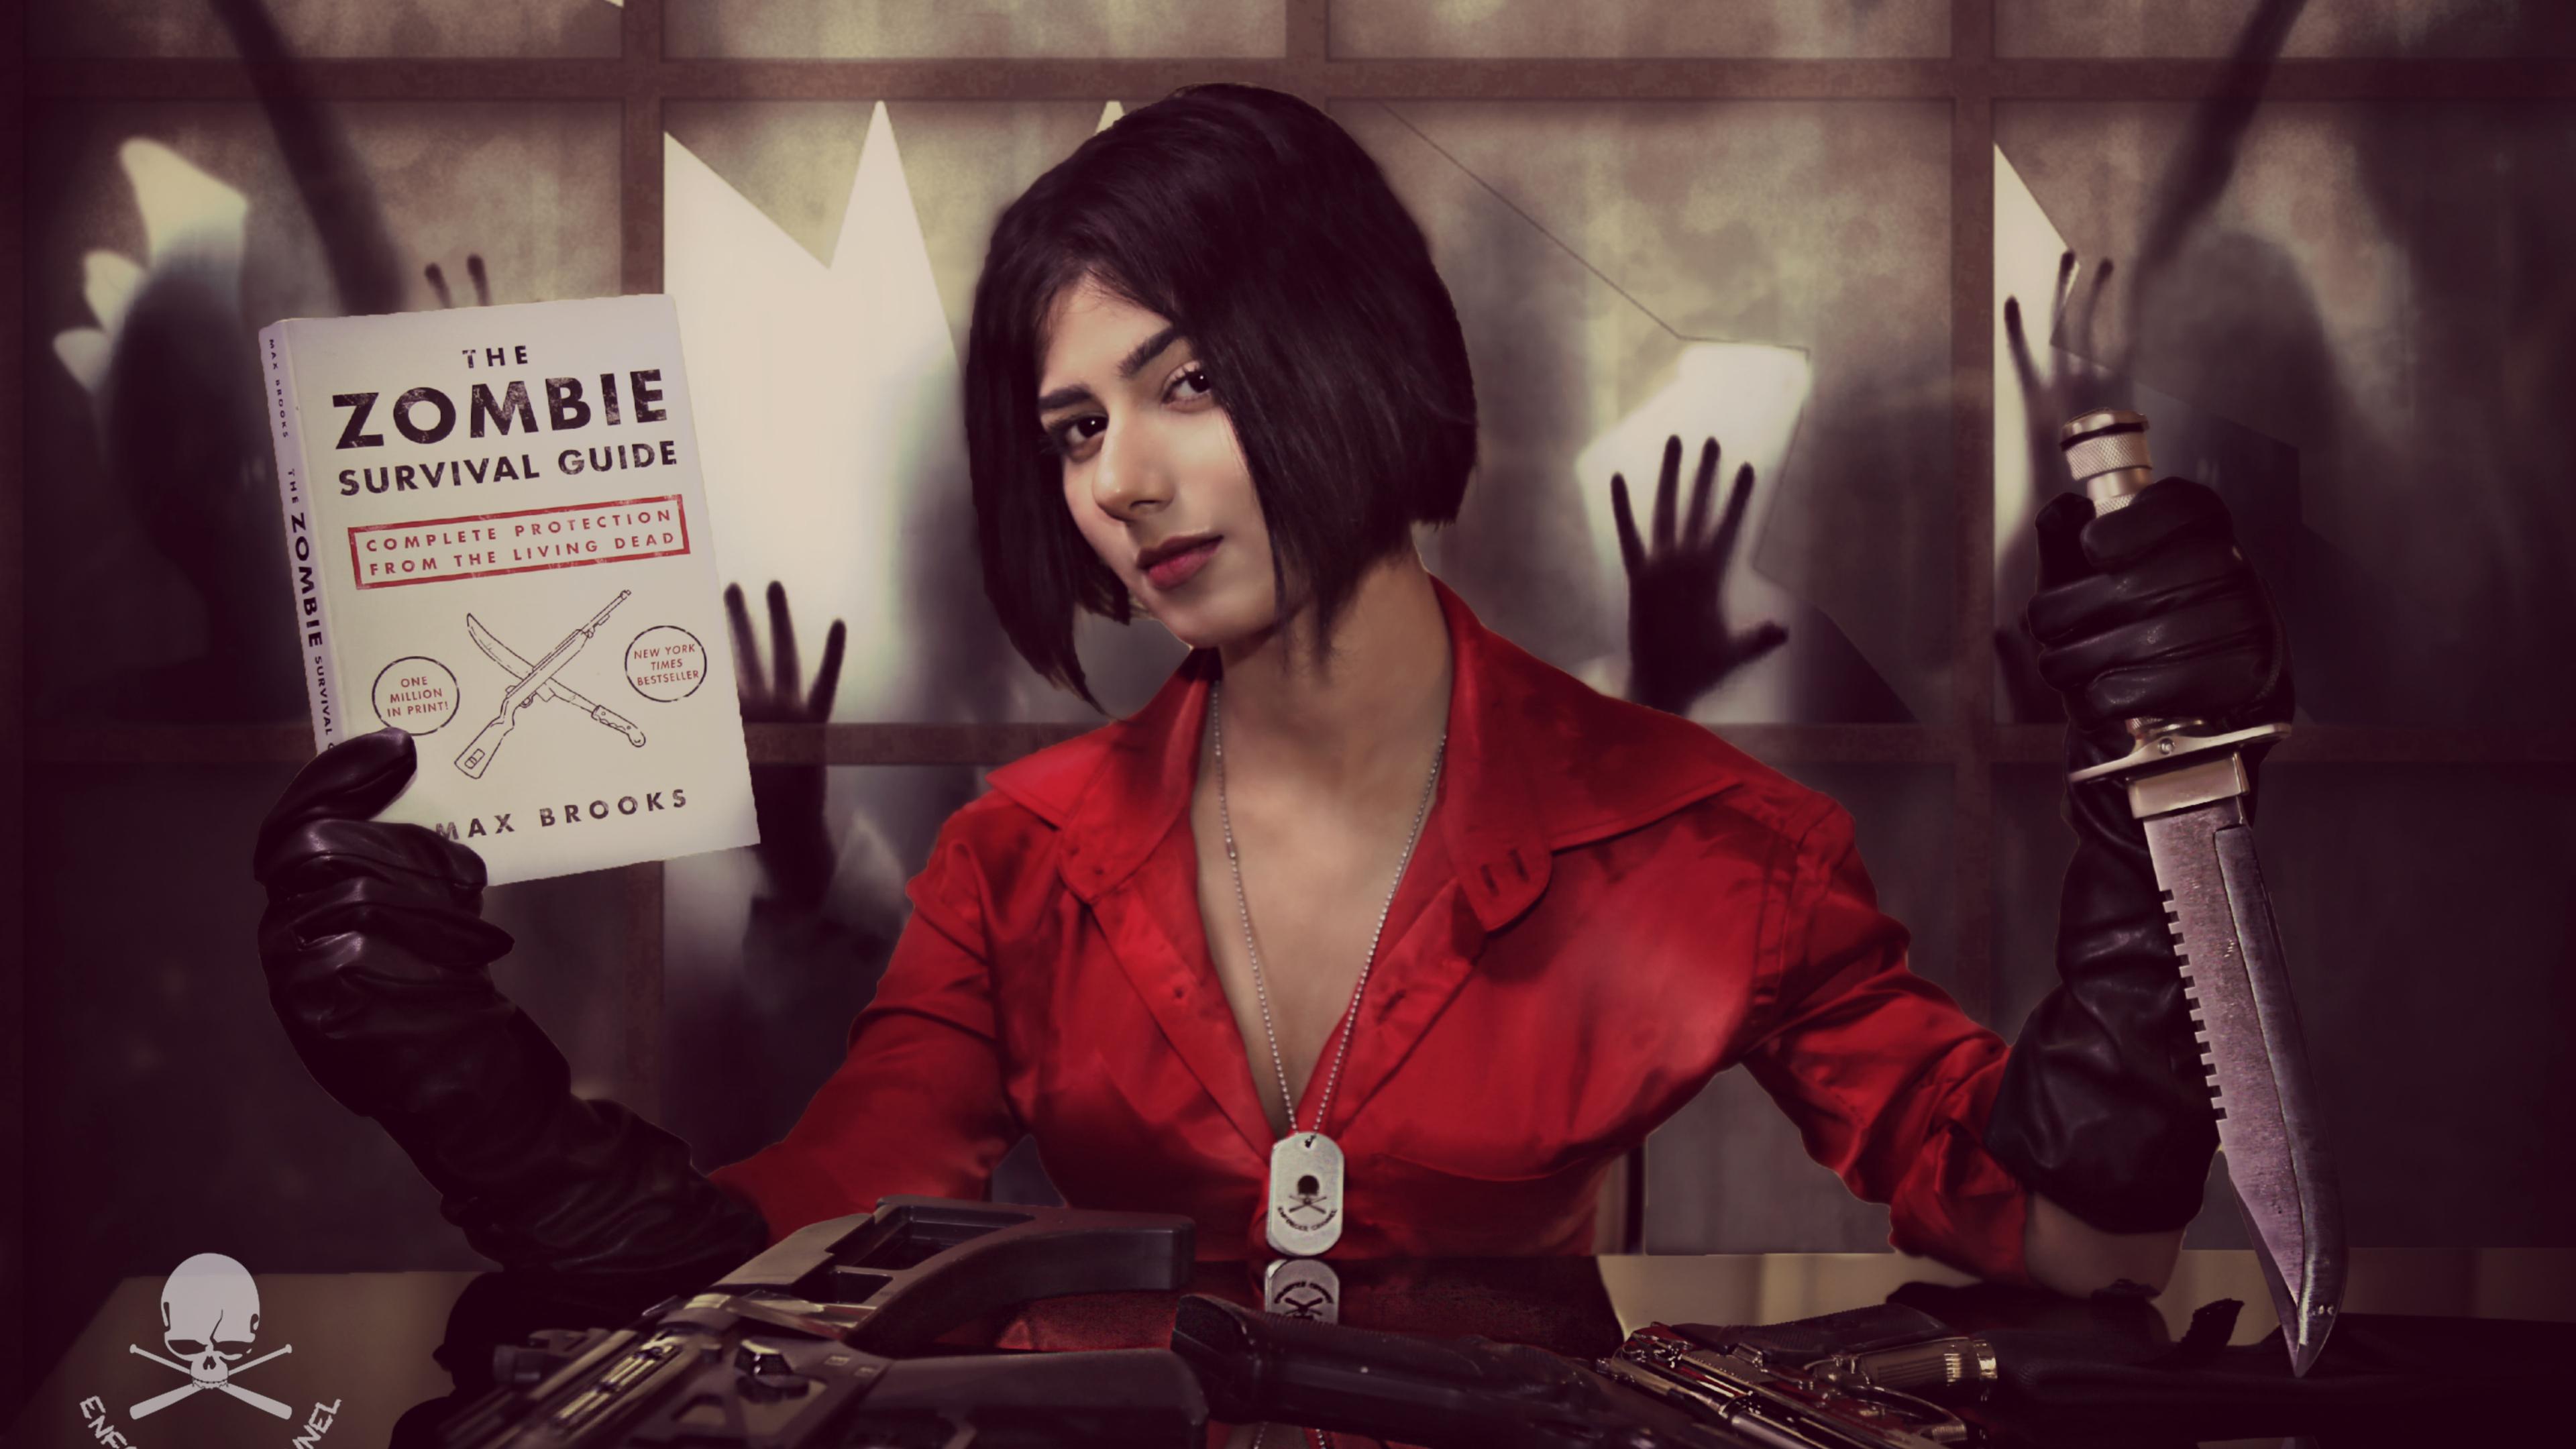 ada wong resident evil cosplay 4k 1554244424 - Ada Wong Resident Evil Cosplay 4k - resident evil 2 wallpapers, hd-wallpapers, games wallpapers, 5k wallpapers, 4k-wallpapers, 2019 games wallpapers